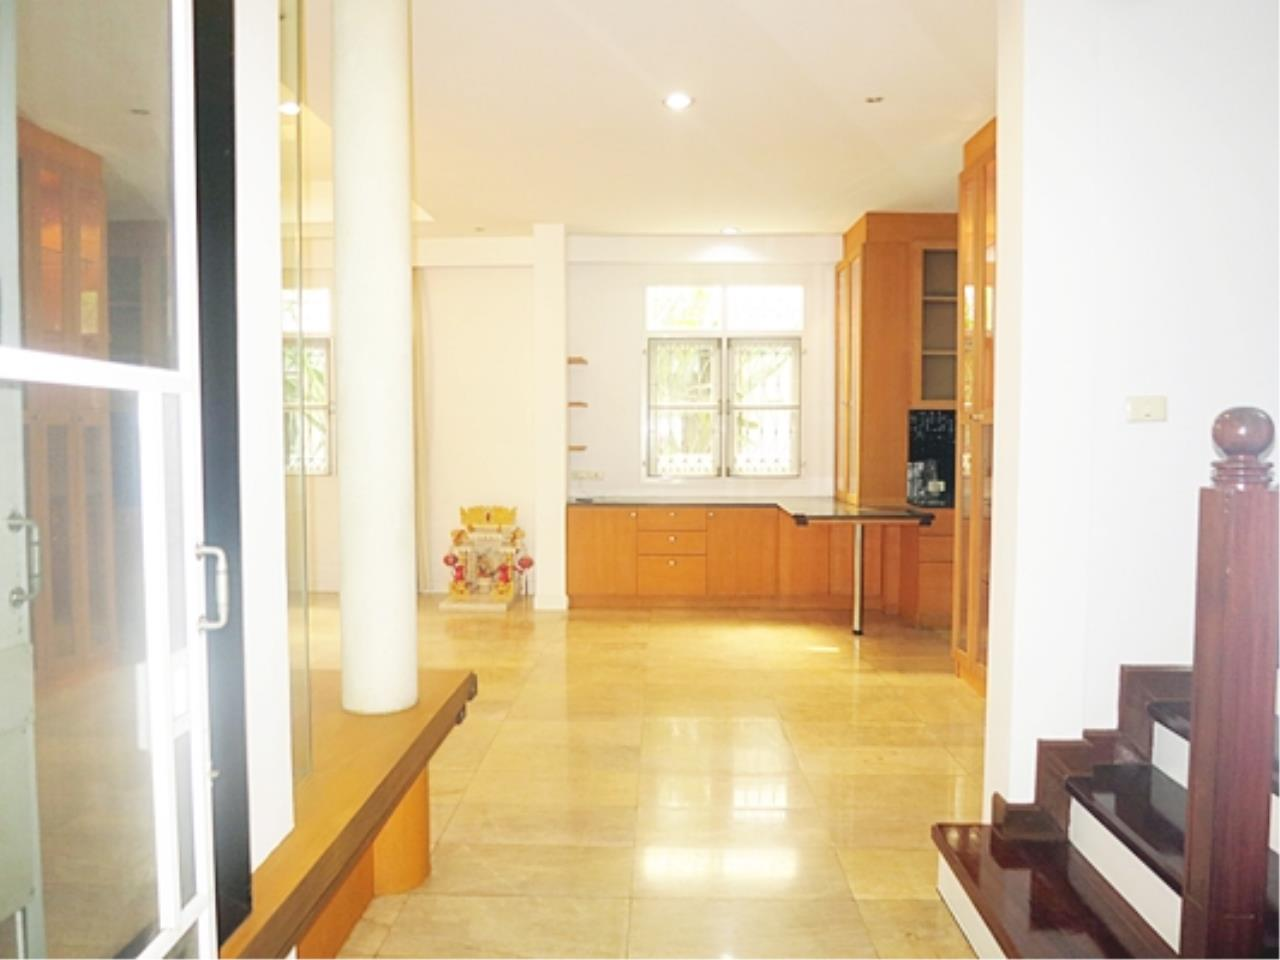 Estate Corner Agency (Samut Prakan) Agency's Single house for sale Ladprao, fully furnished. 6